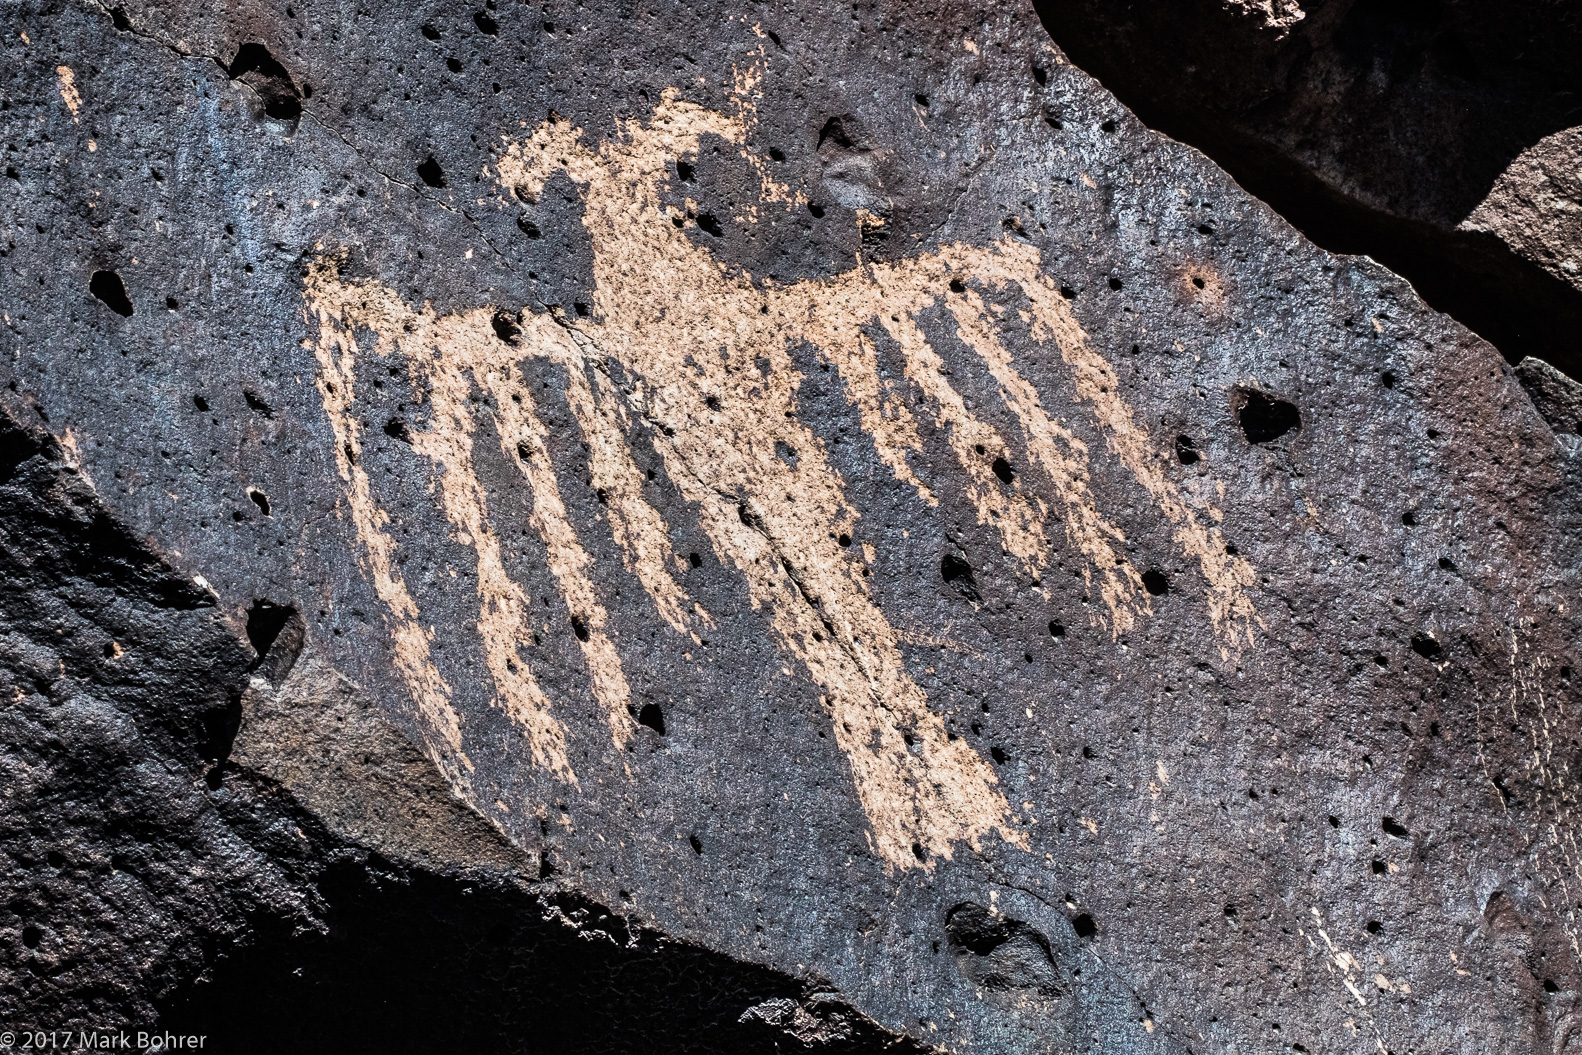 Thunderbird - La Cieneguilla Petroglyph Site